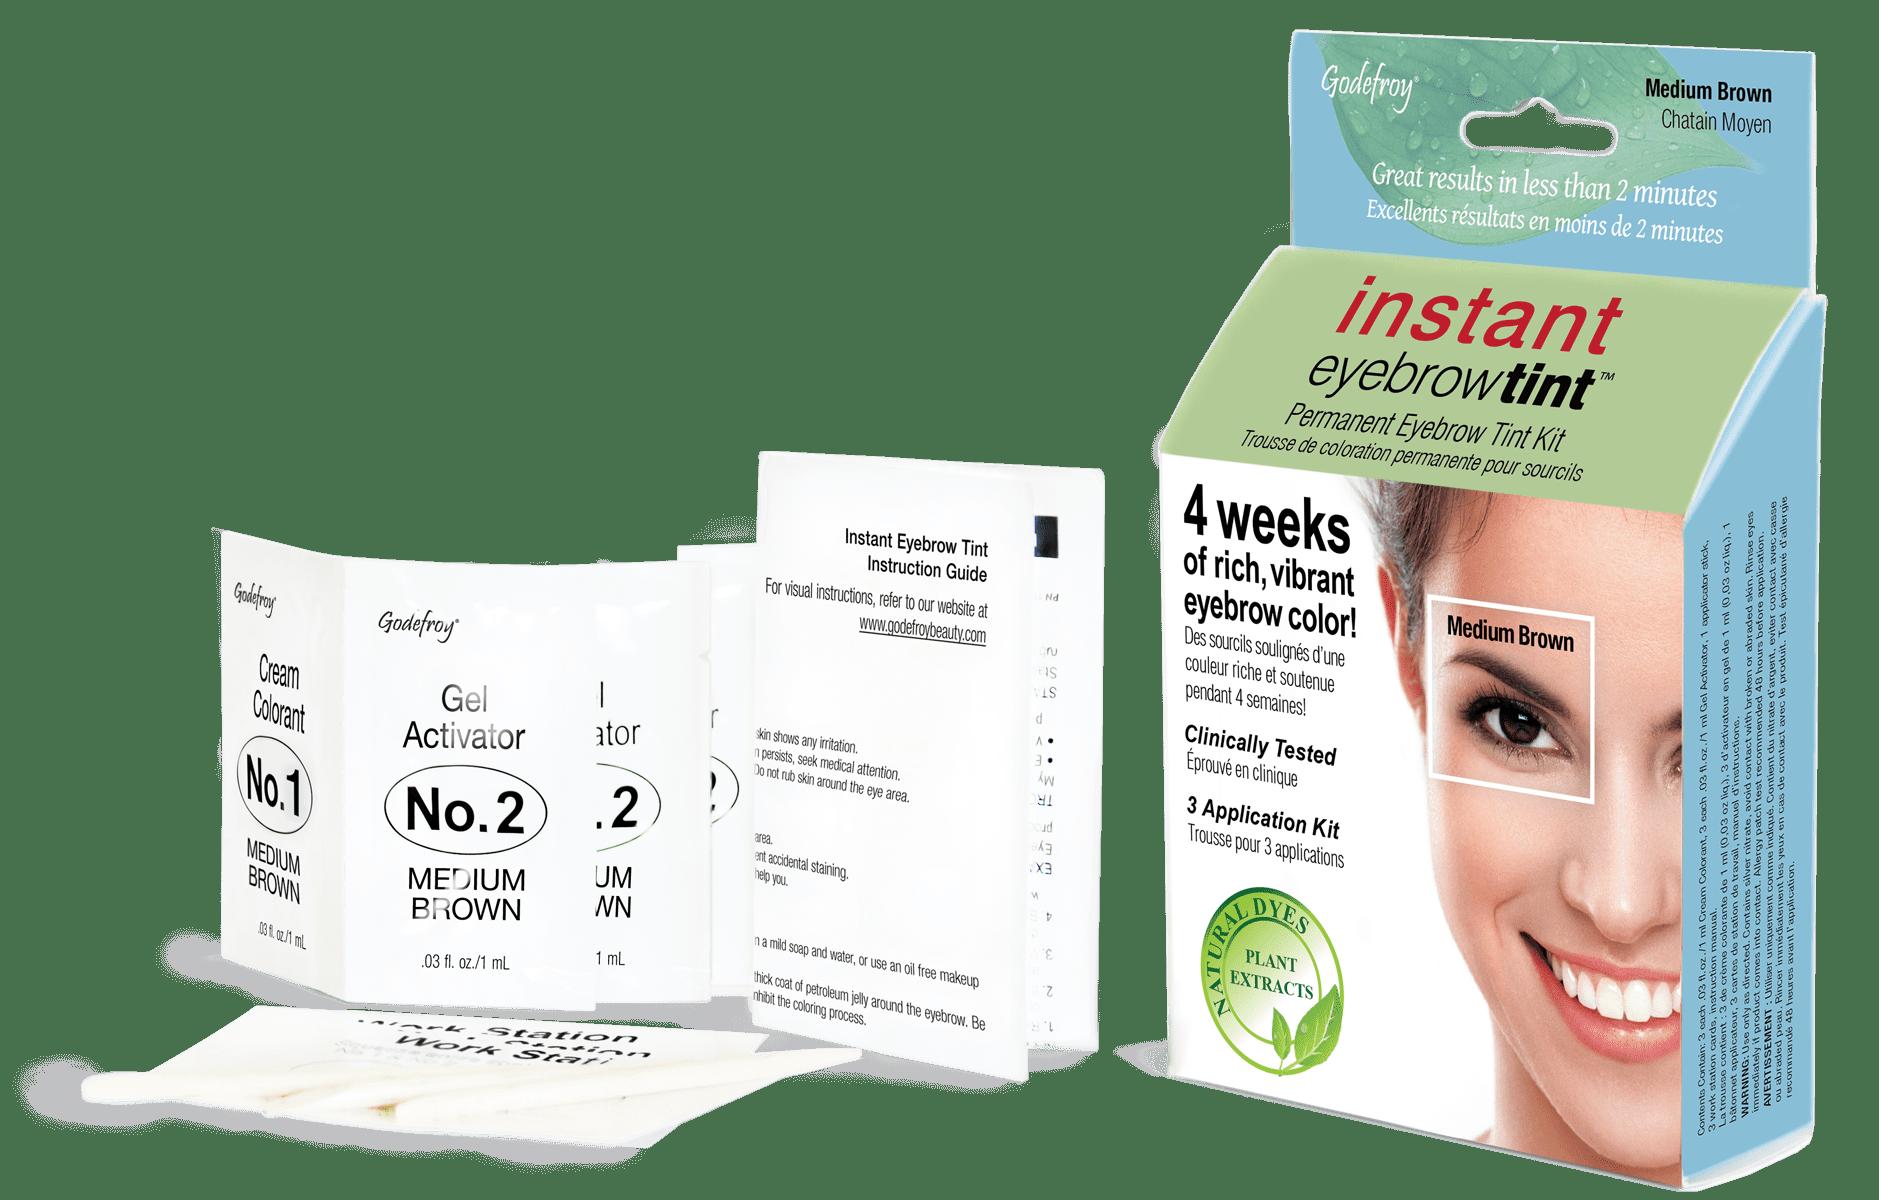 Godefroy Instant Eyebrow Tint, 3 application kit, Medium ...